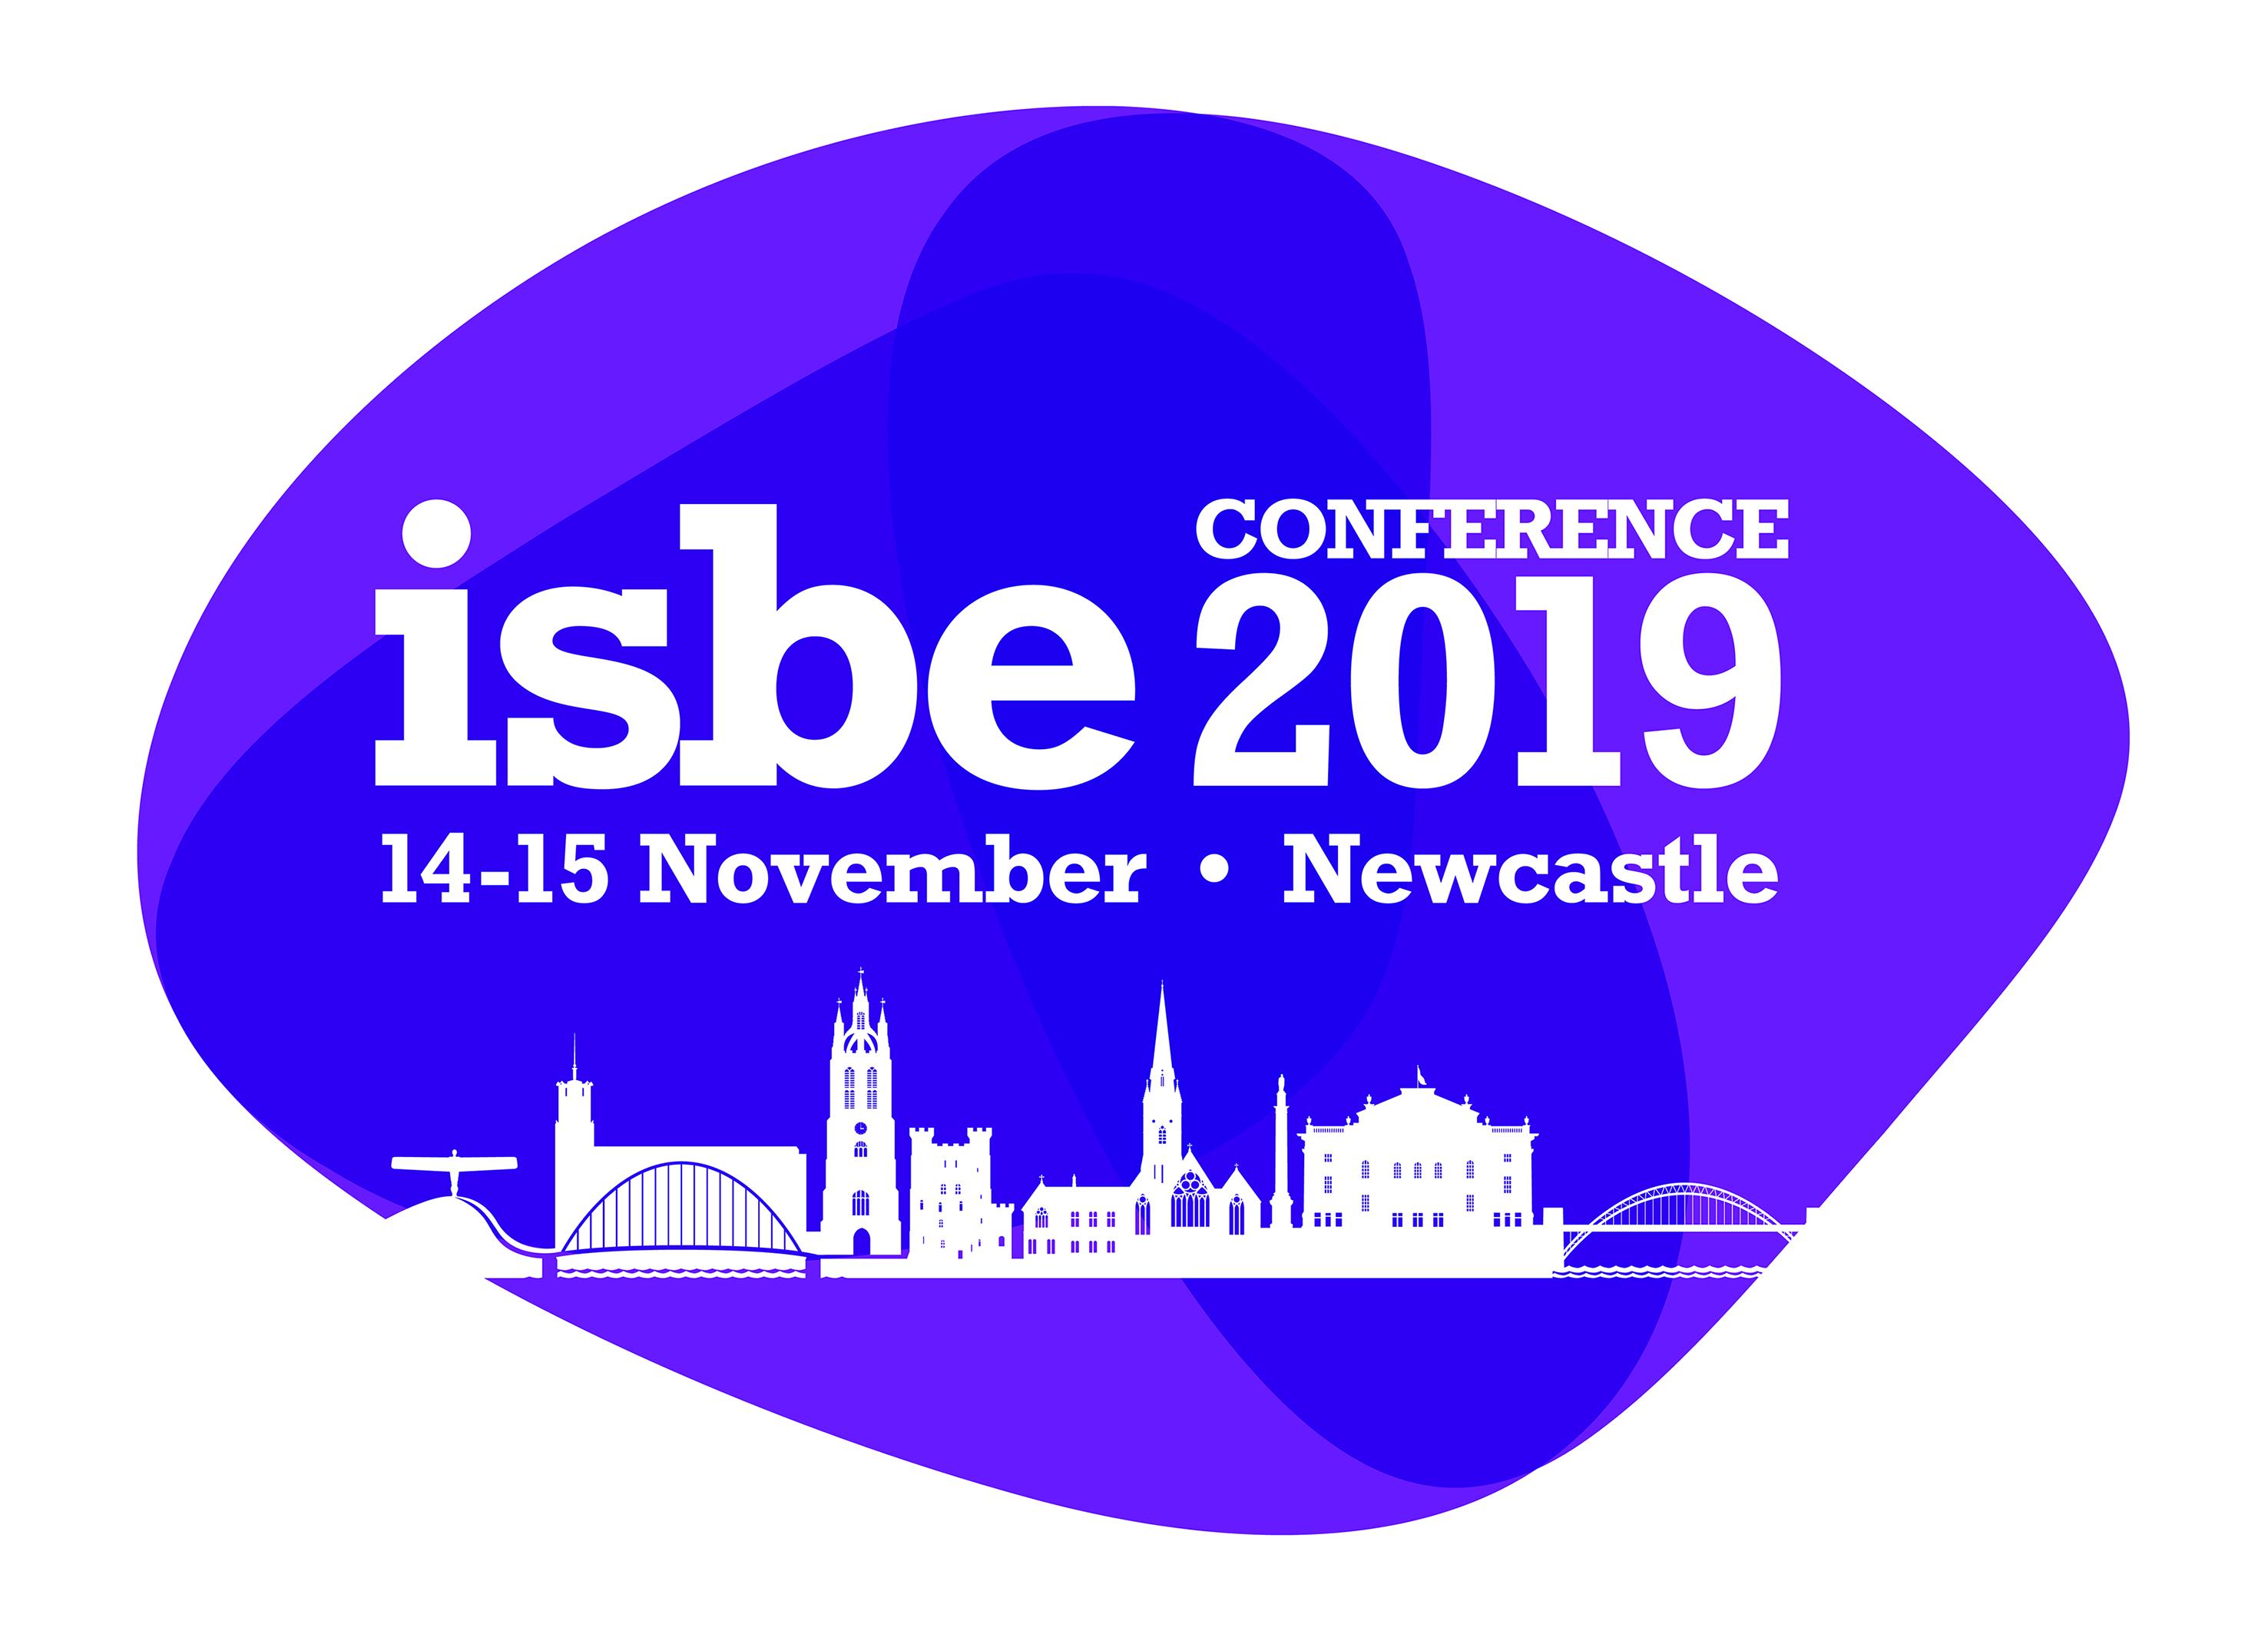 ISBE 2019 - ISBE